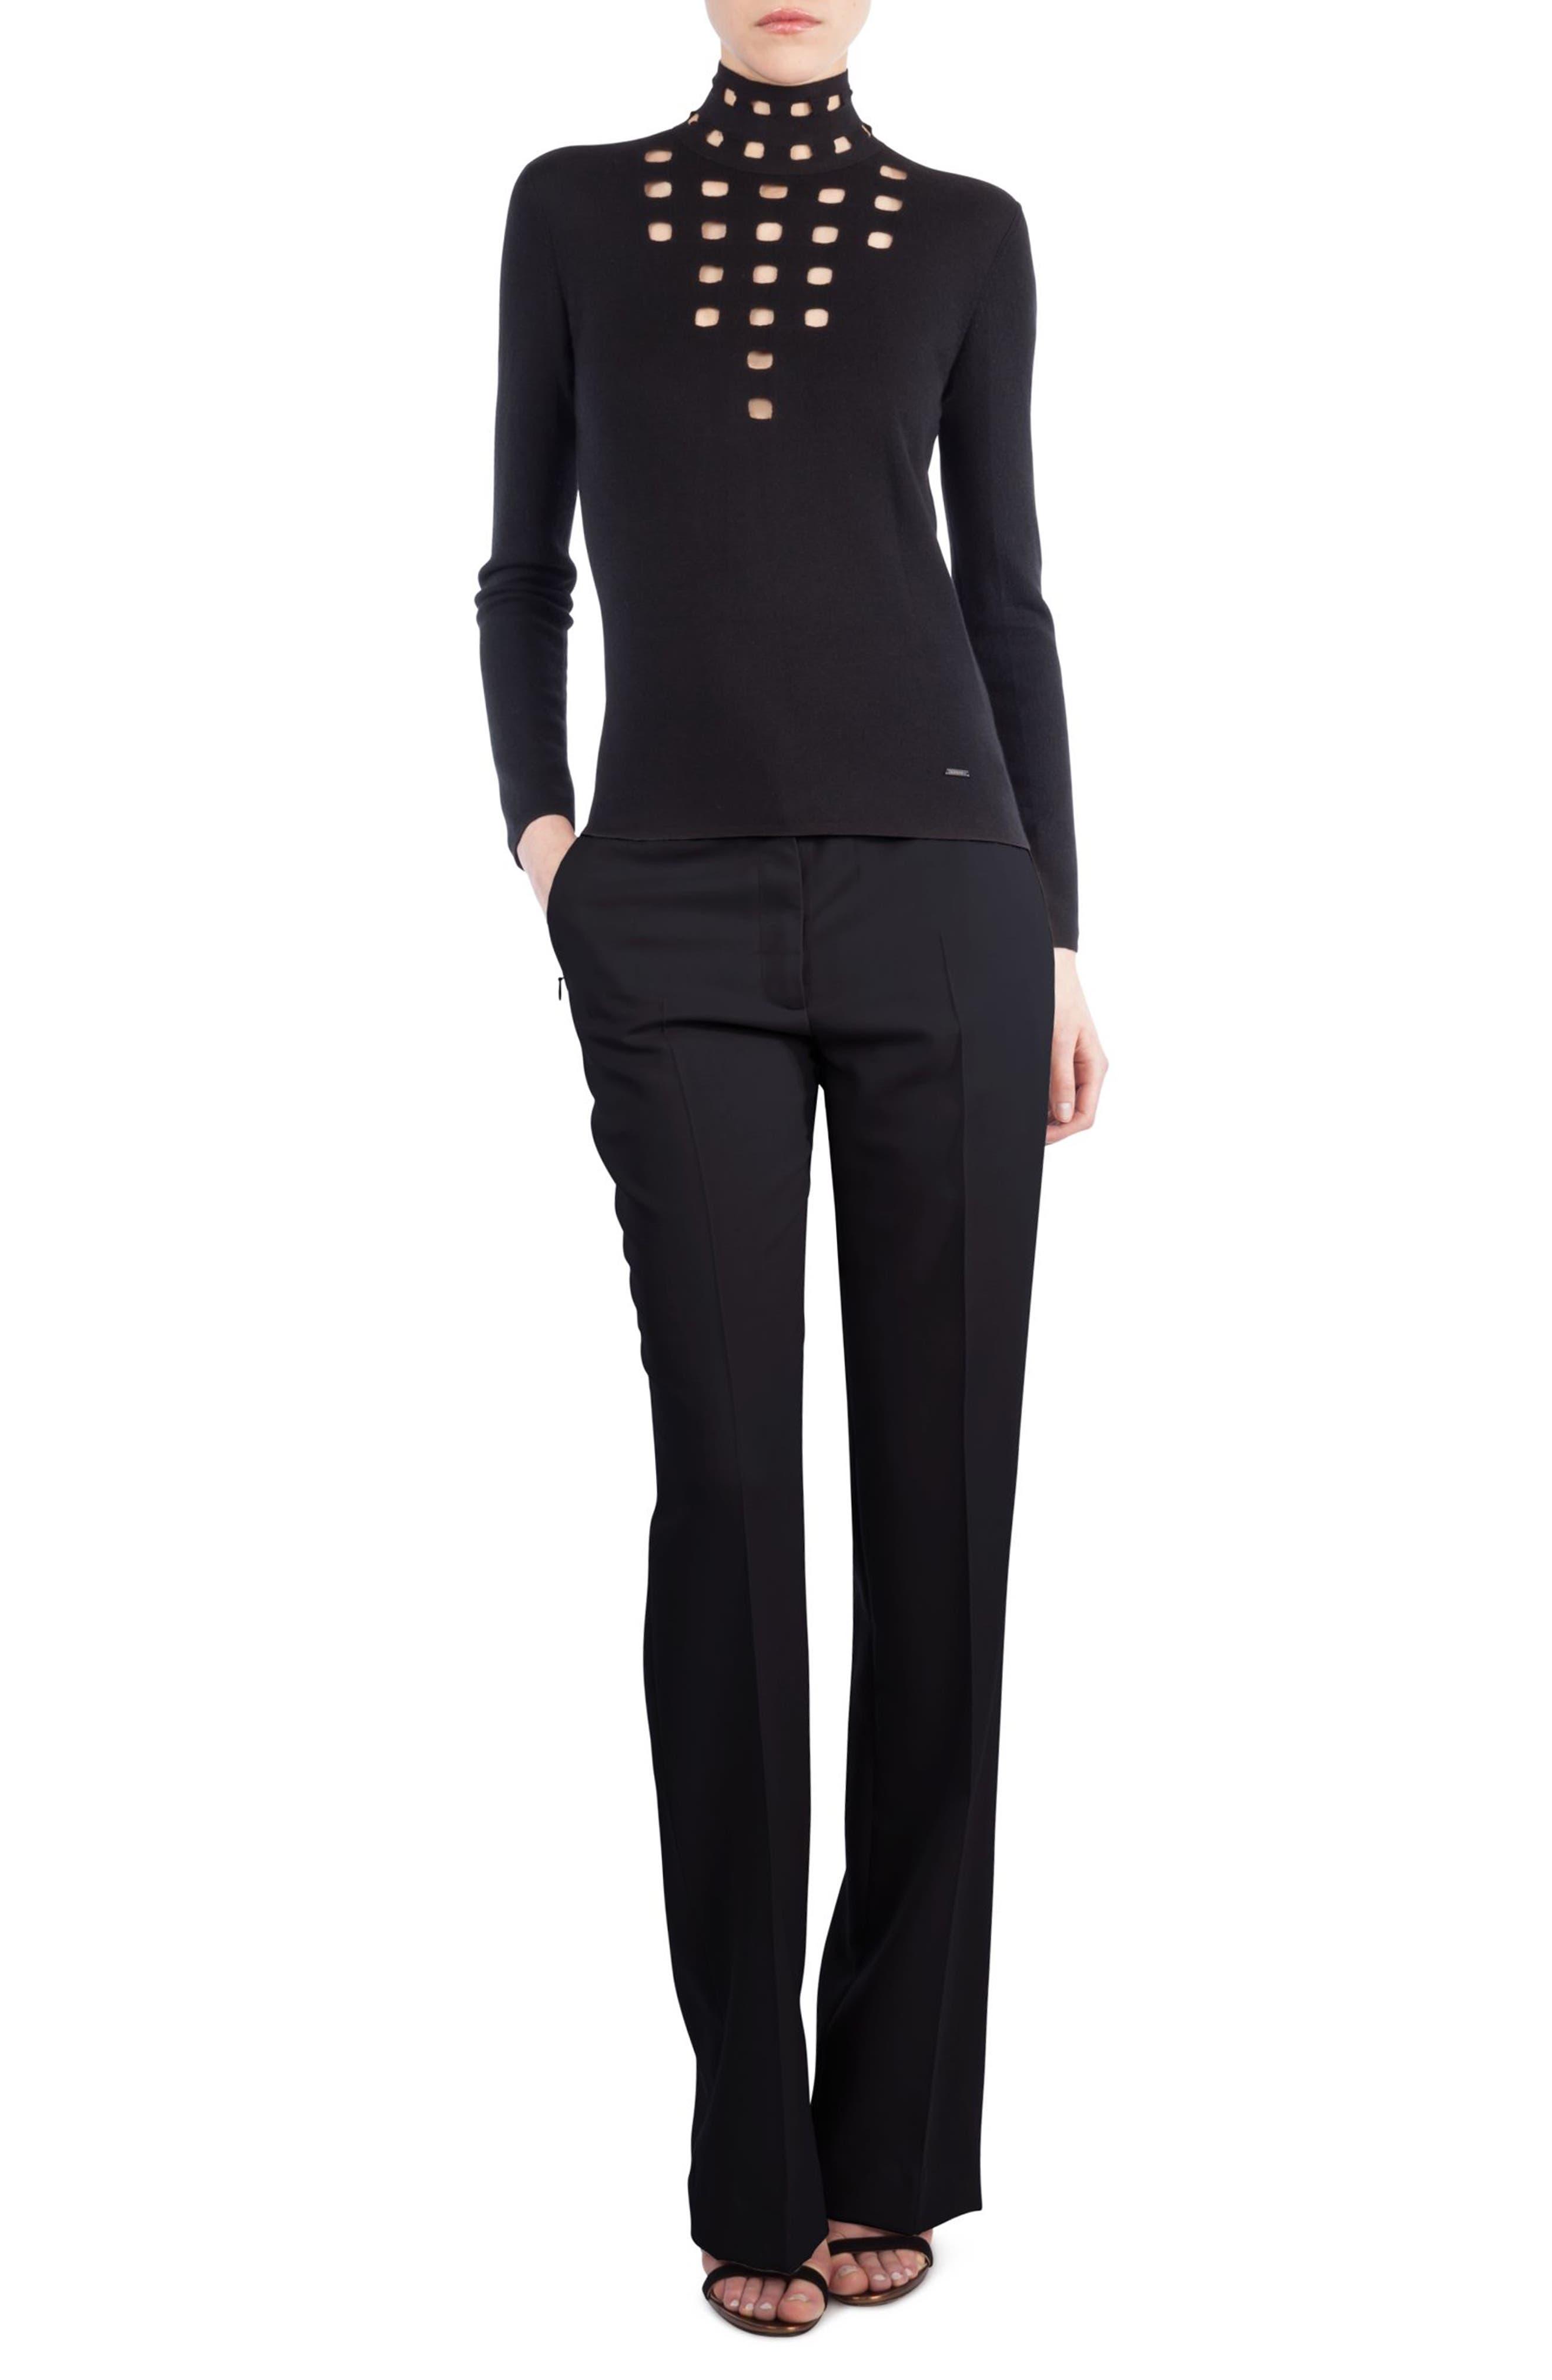 Main Image - Akris St. Gallen Cutout Cashmere & Silk Turtleneck Sweater